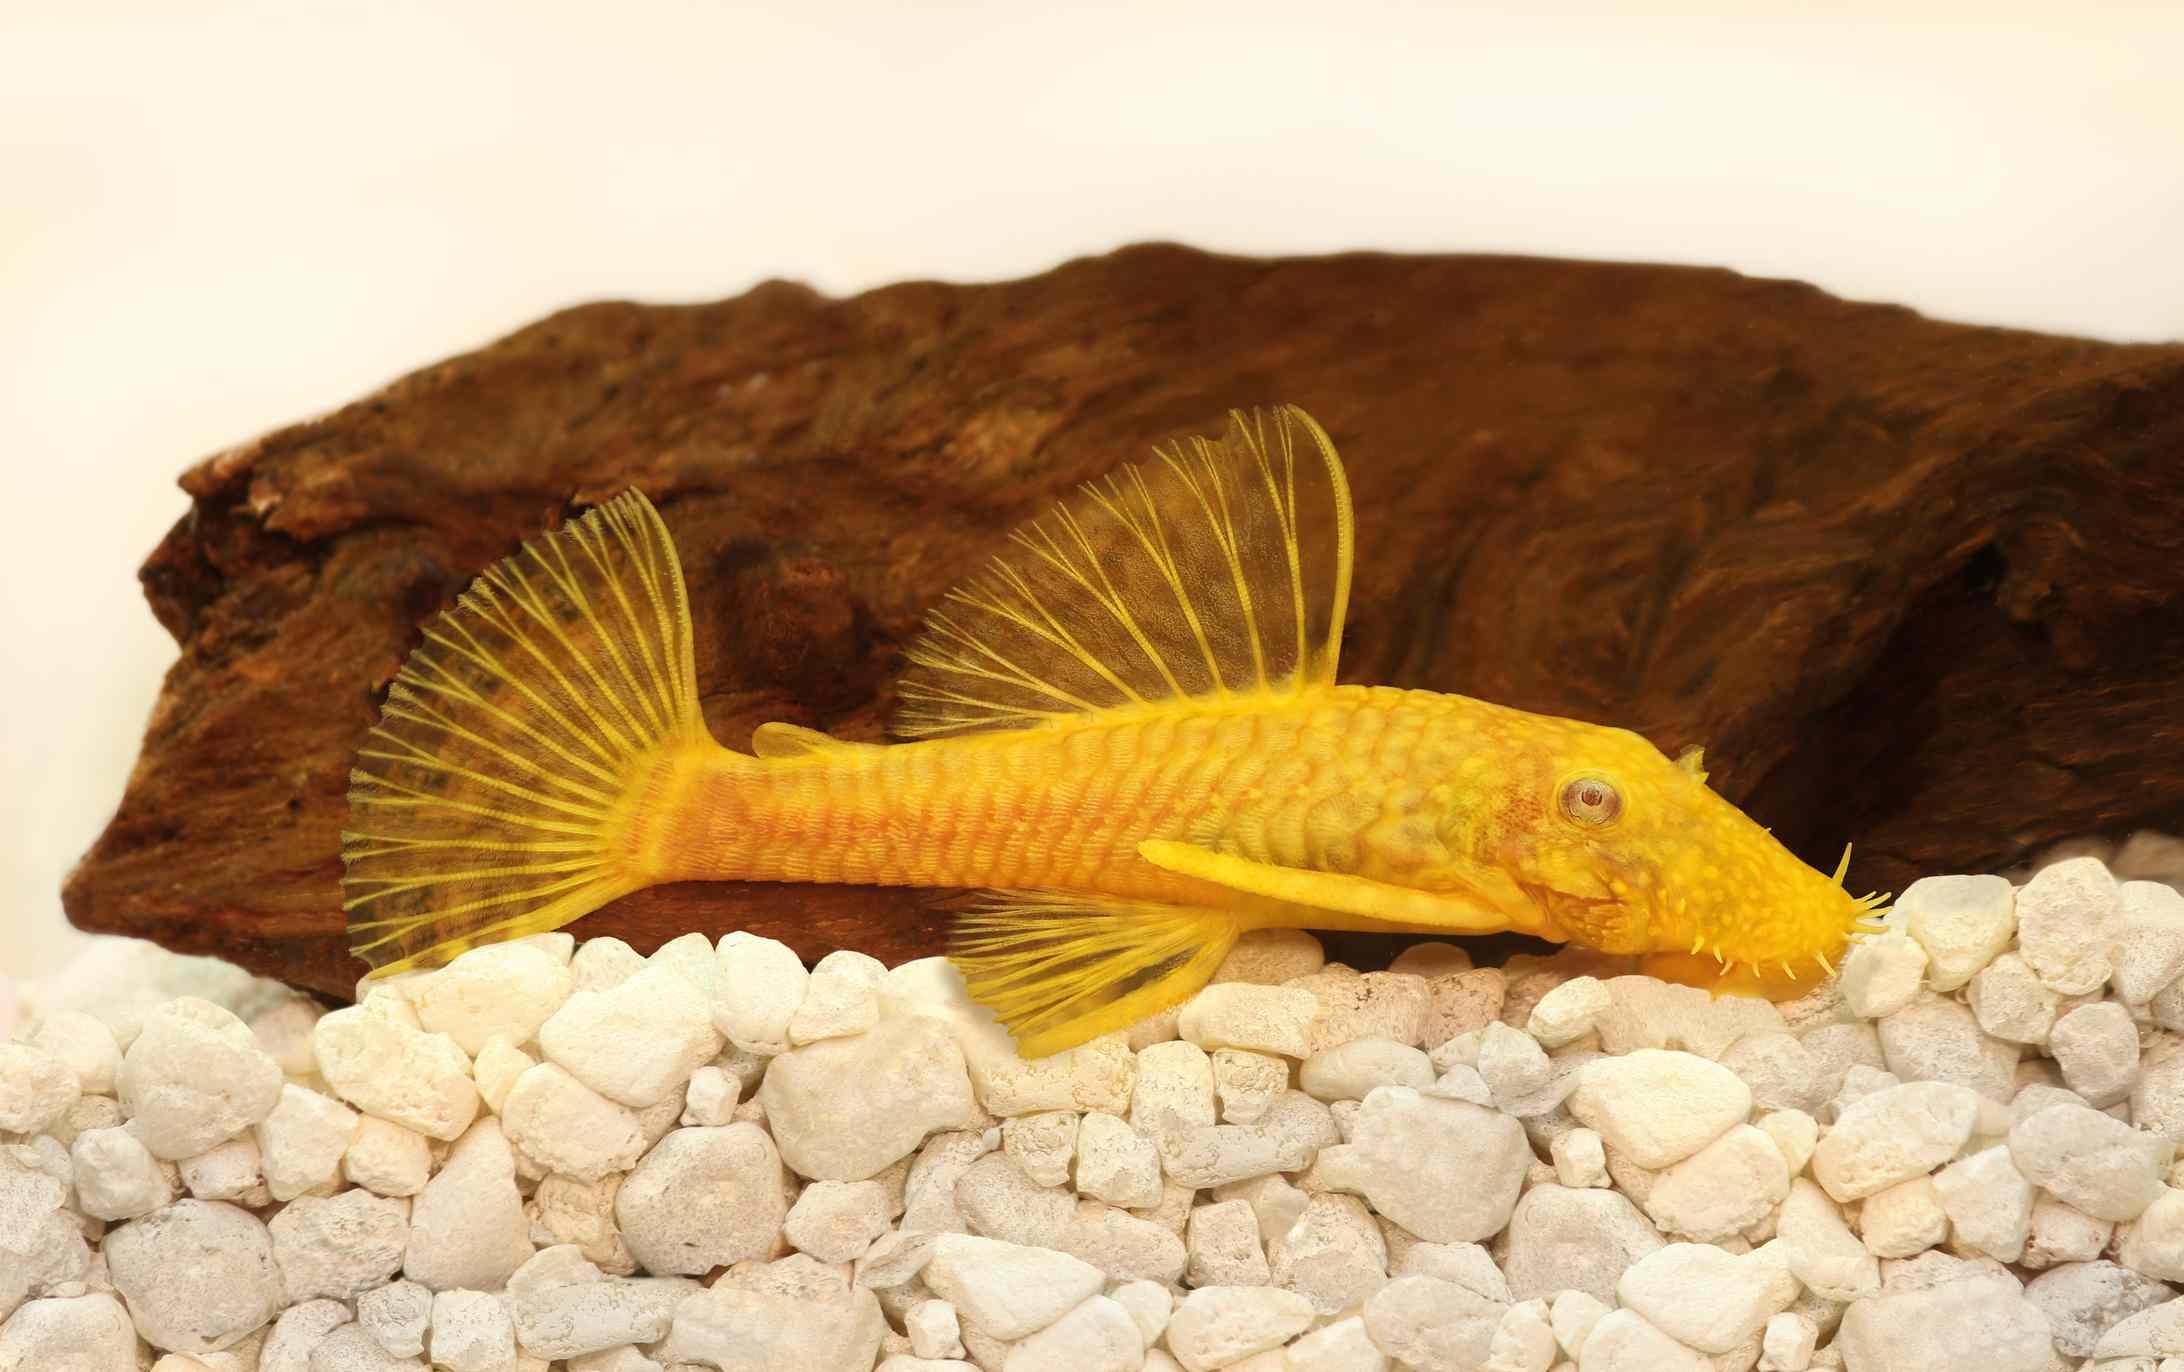 Yellow Bushy-Nose Plecostomous